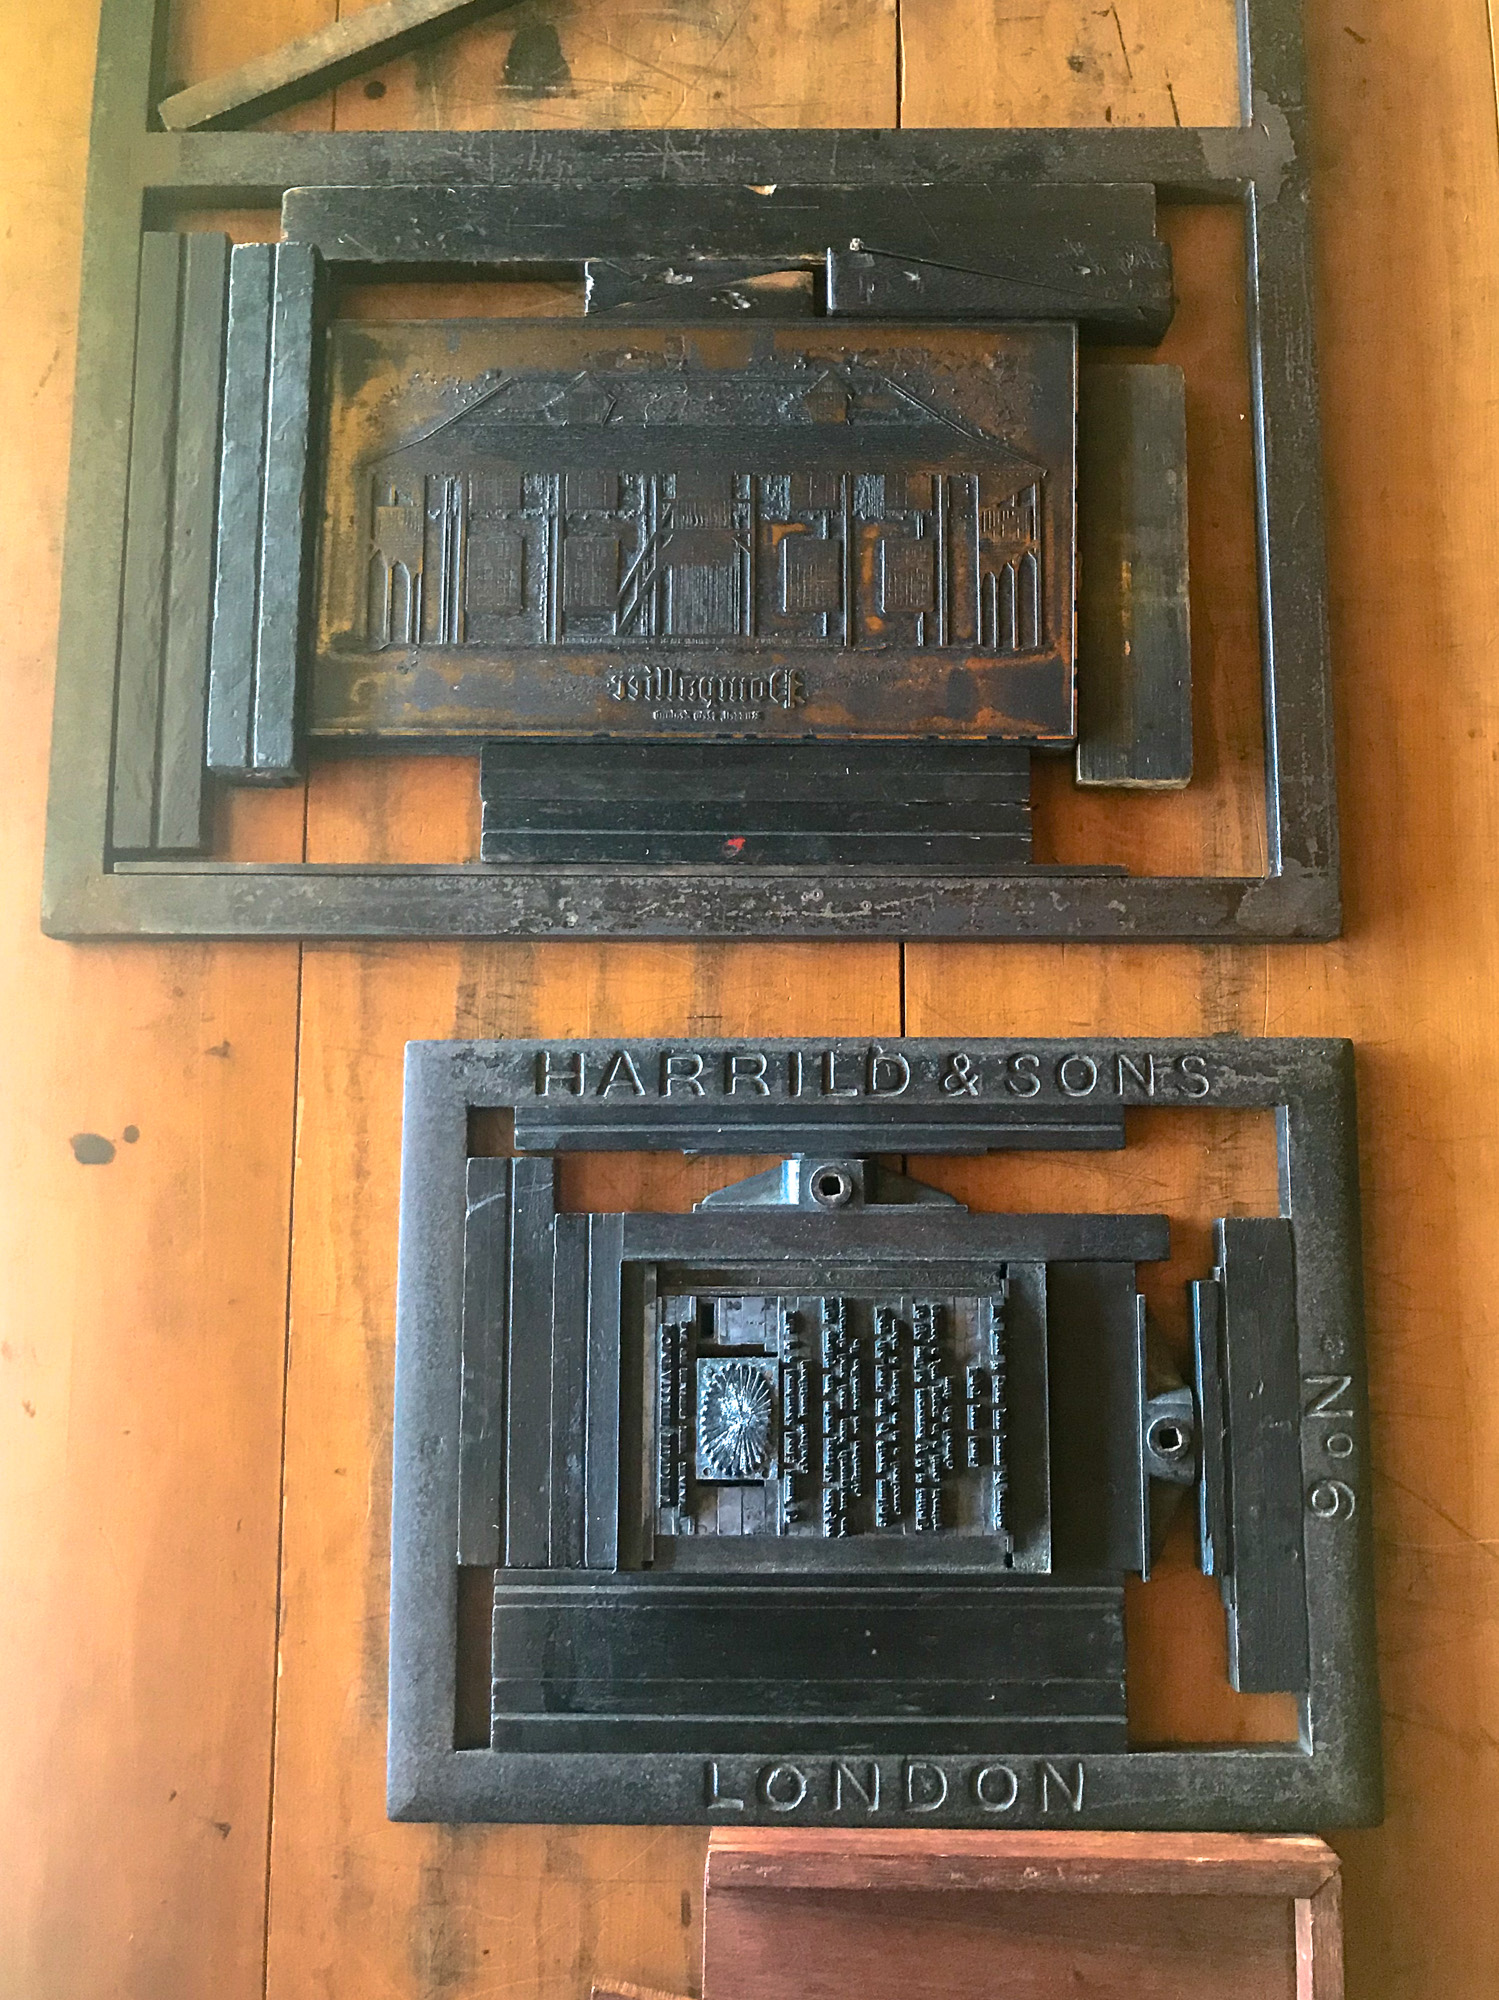 Printing press process